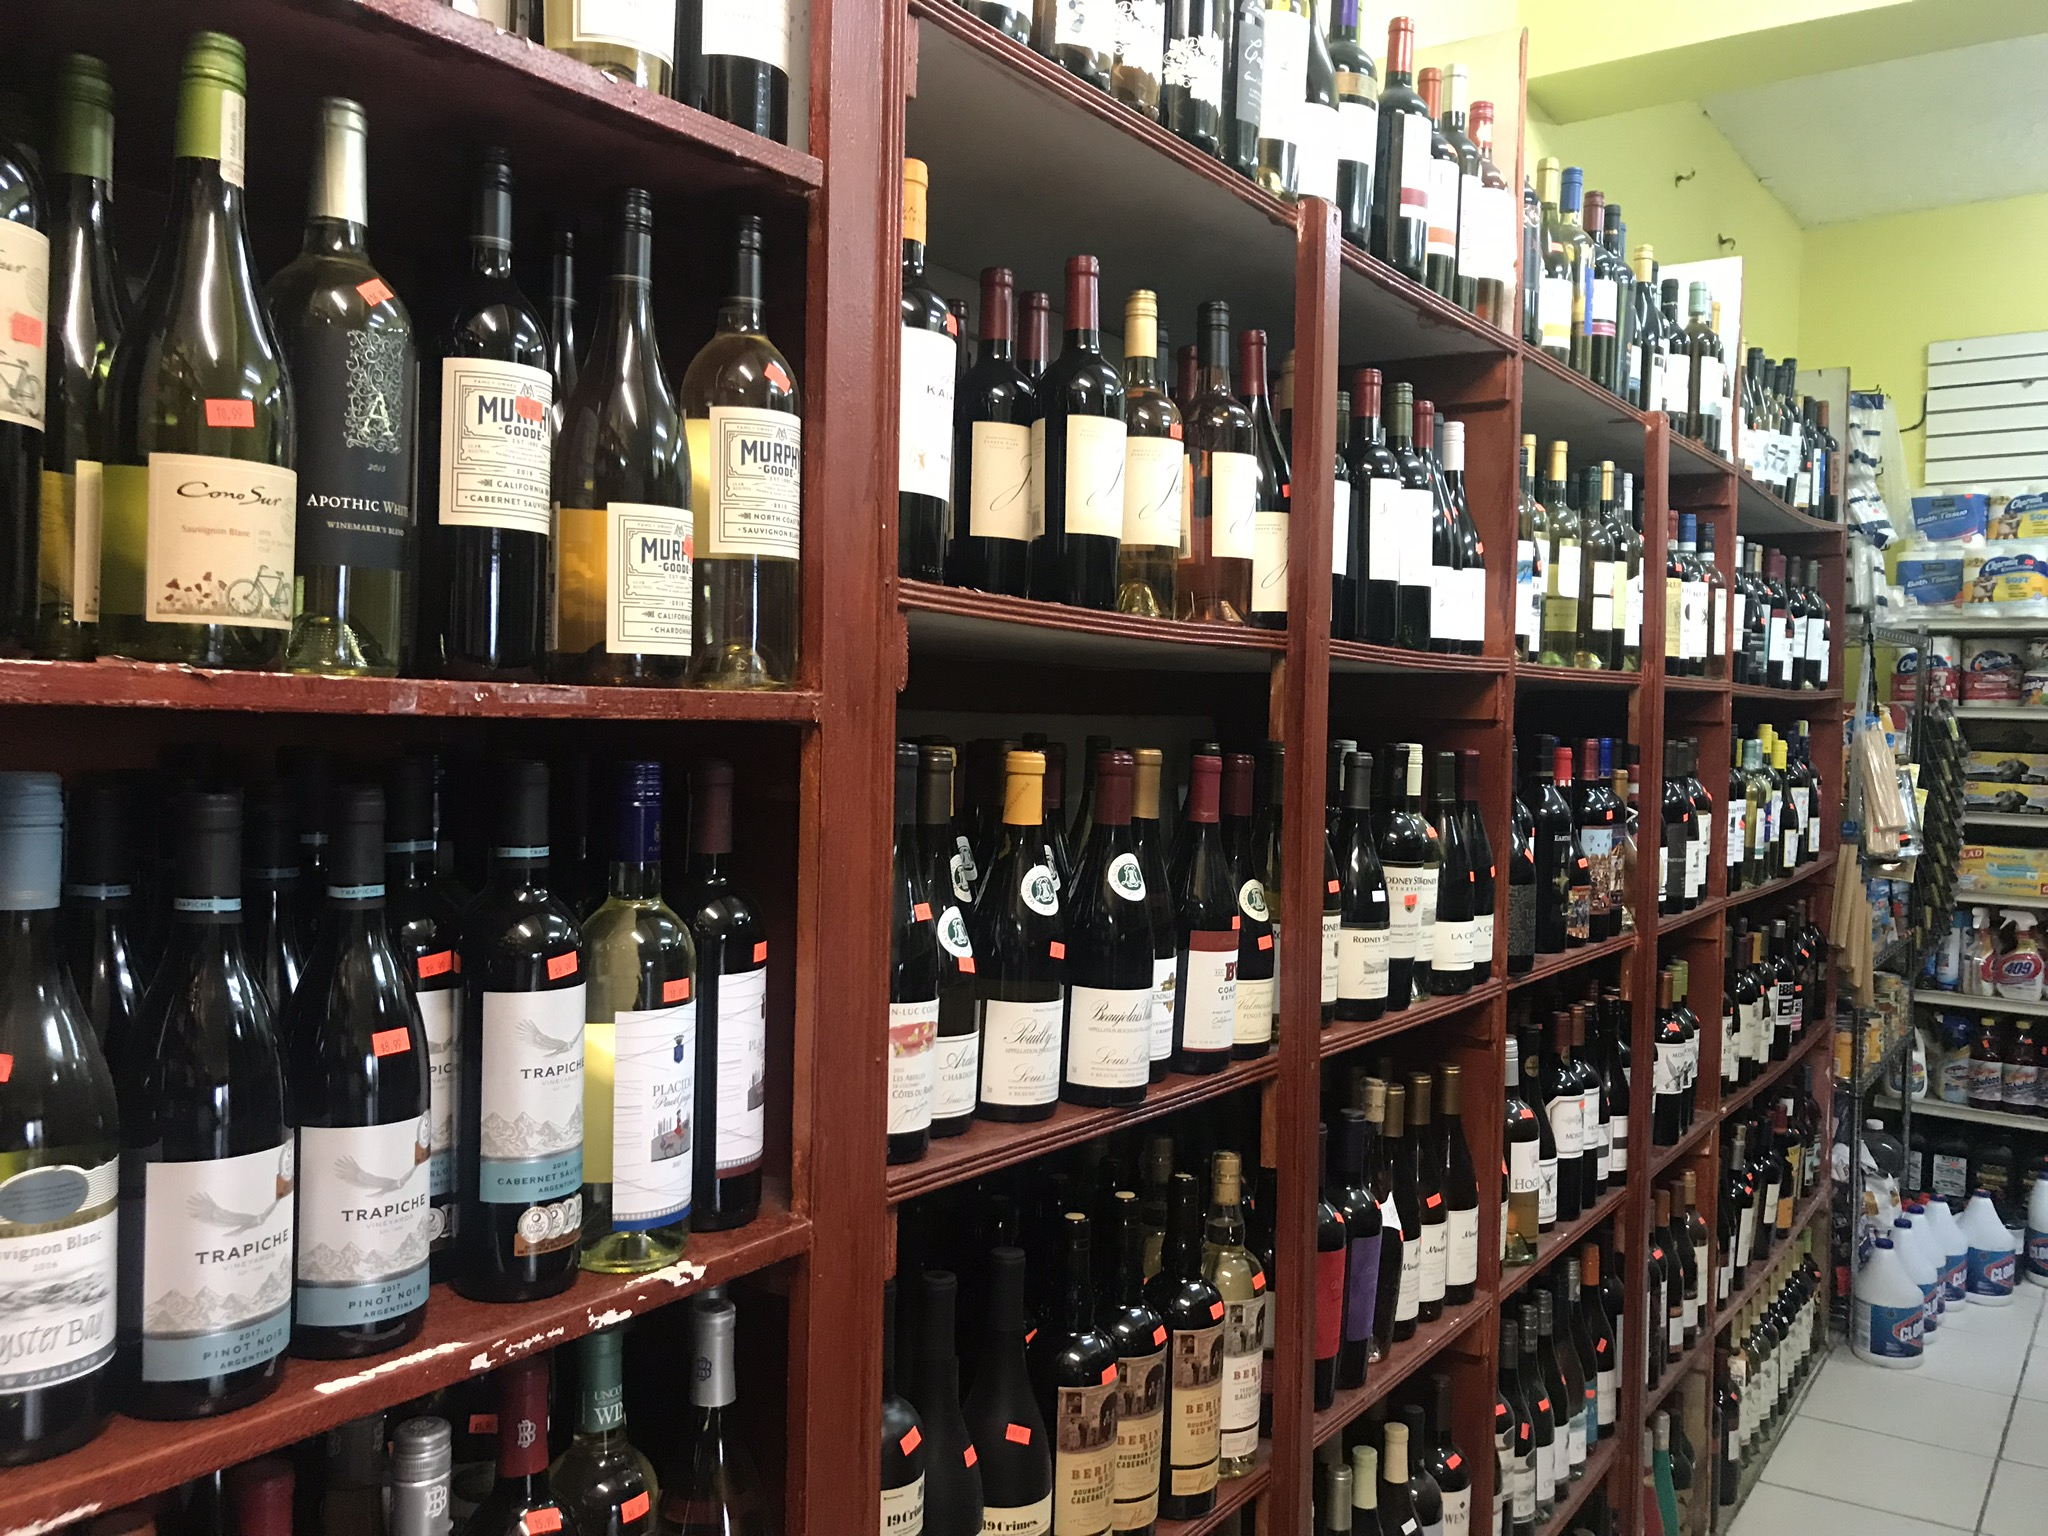 wine-selection-calabash-market-st-john.jpg